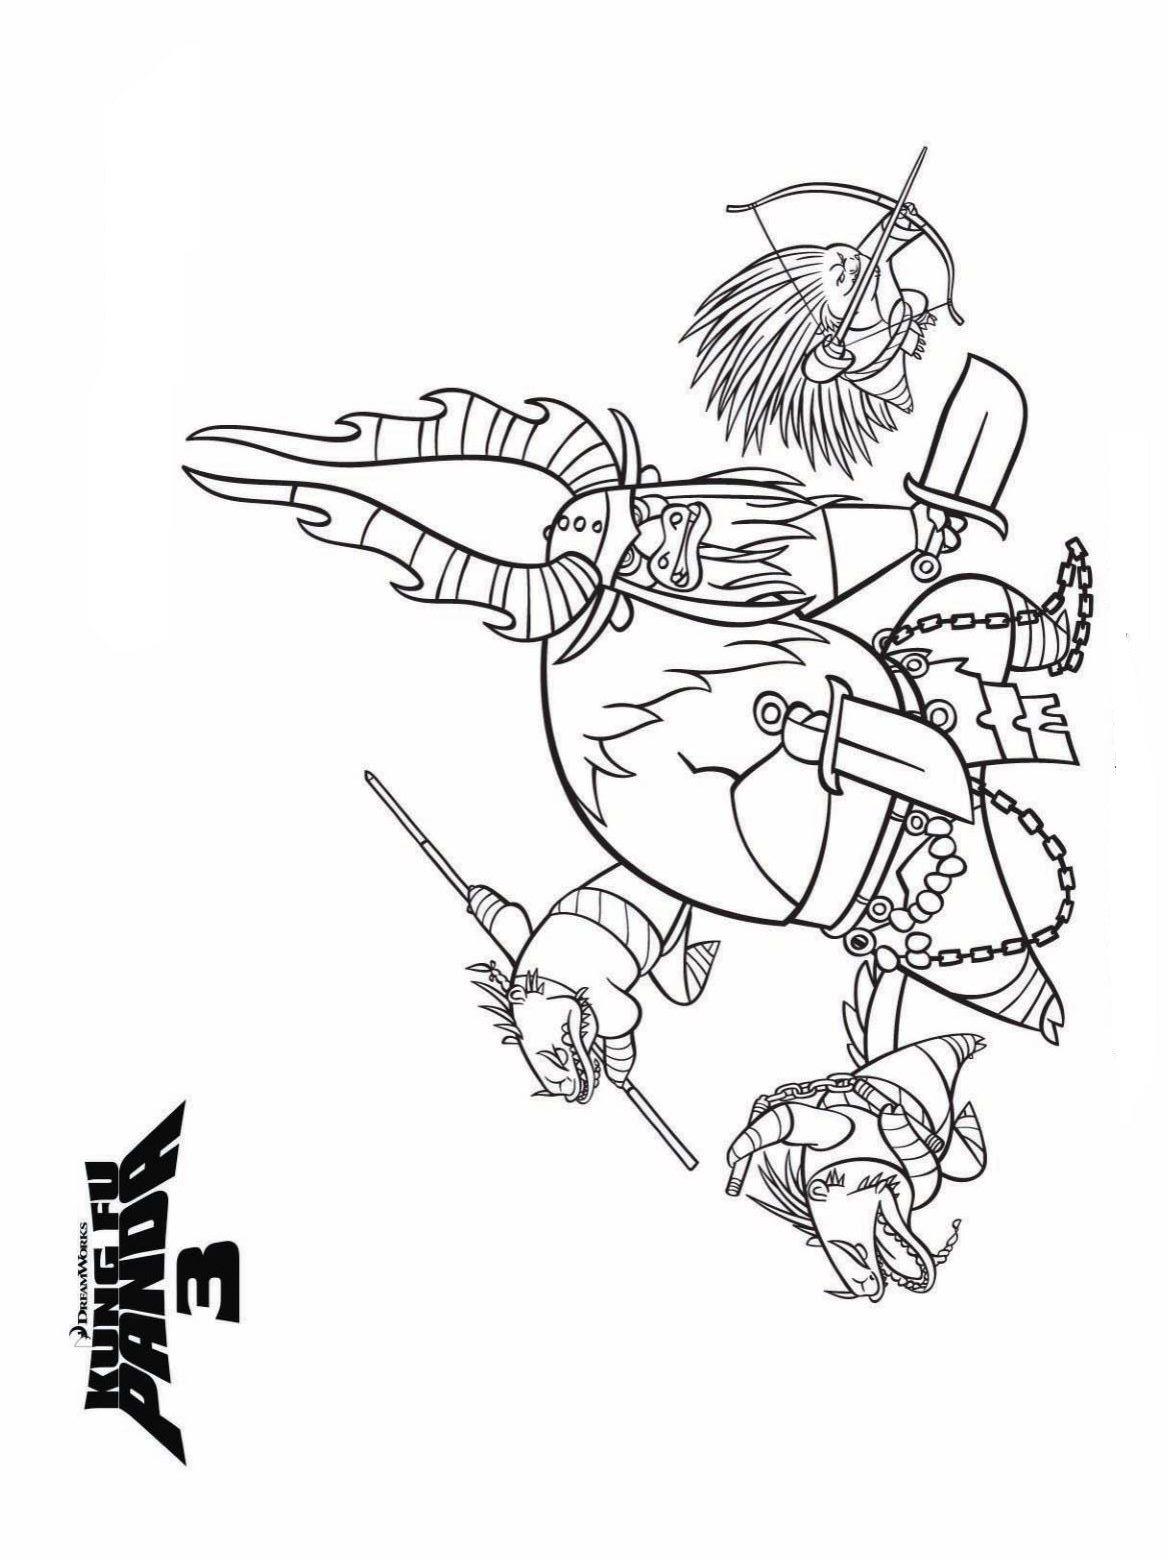 Malvorlage - Kung fu panda 3 ausmalbilder rjgou